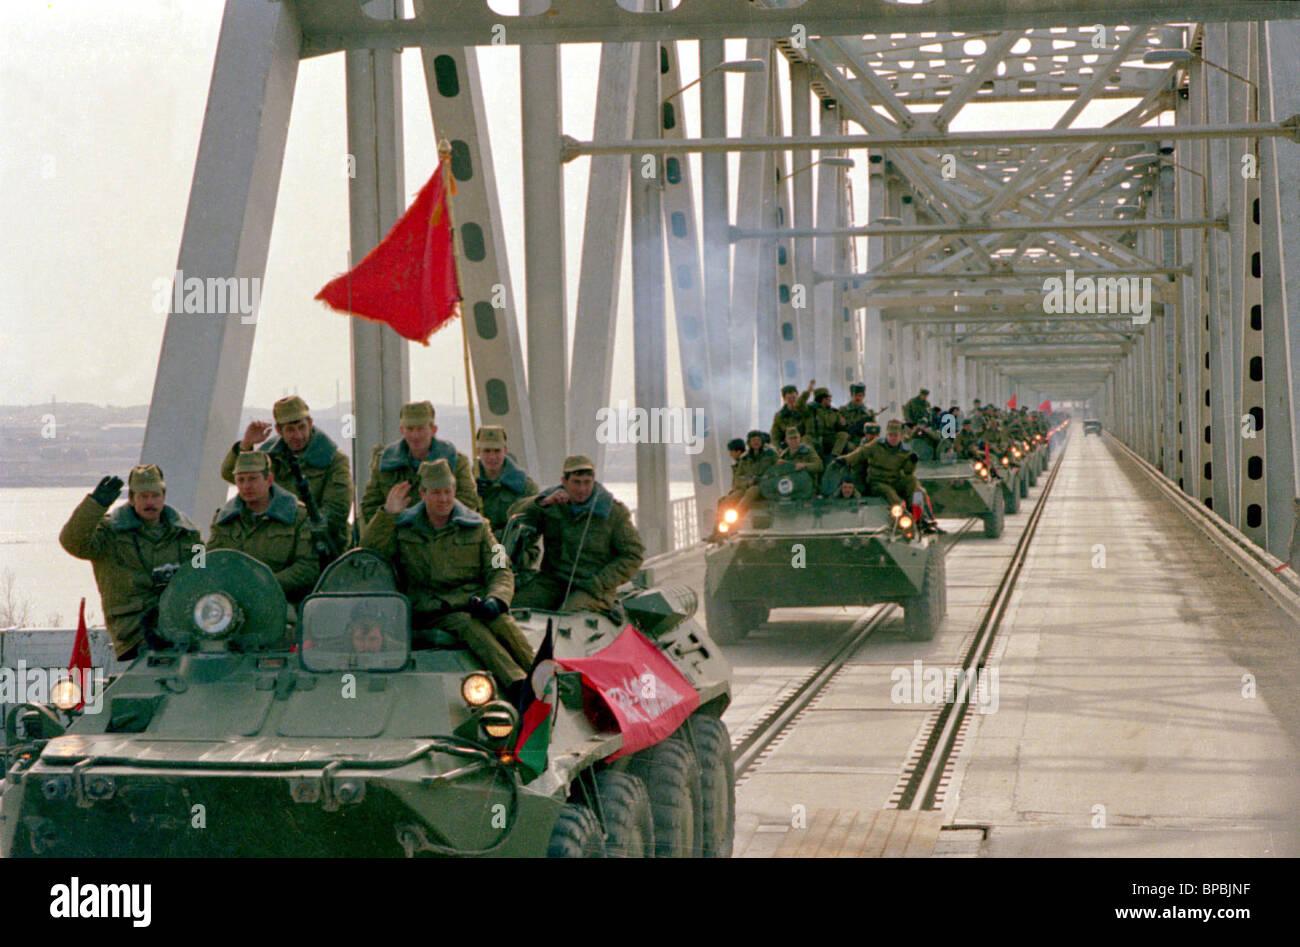 Soviet Afghanistan war - Page 6 Soviet-army-BPBJNF